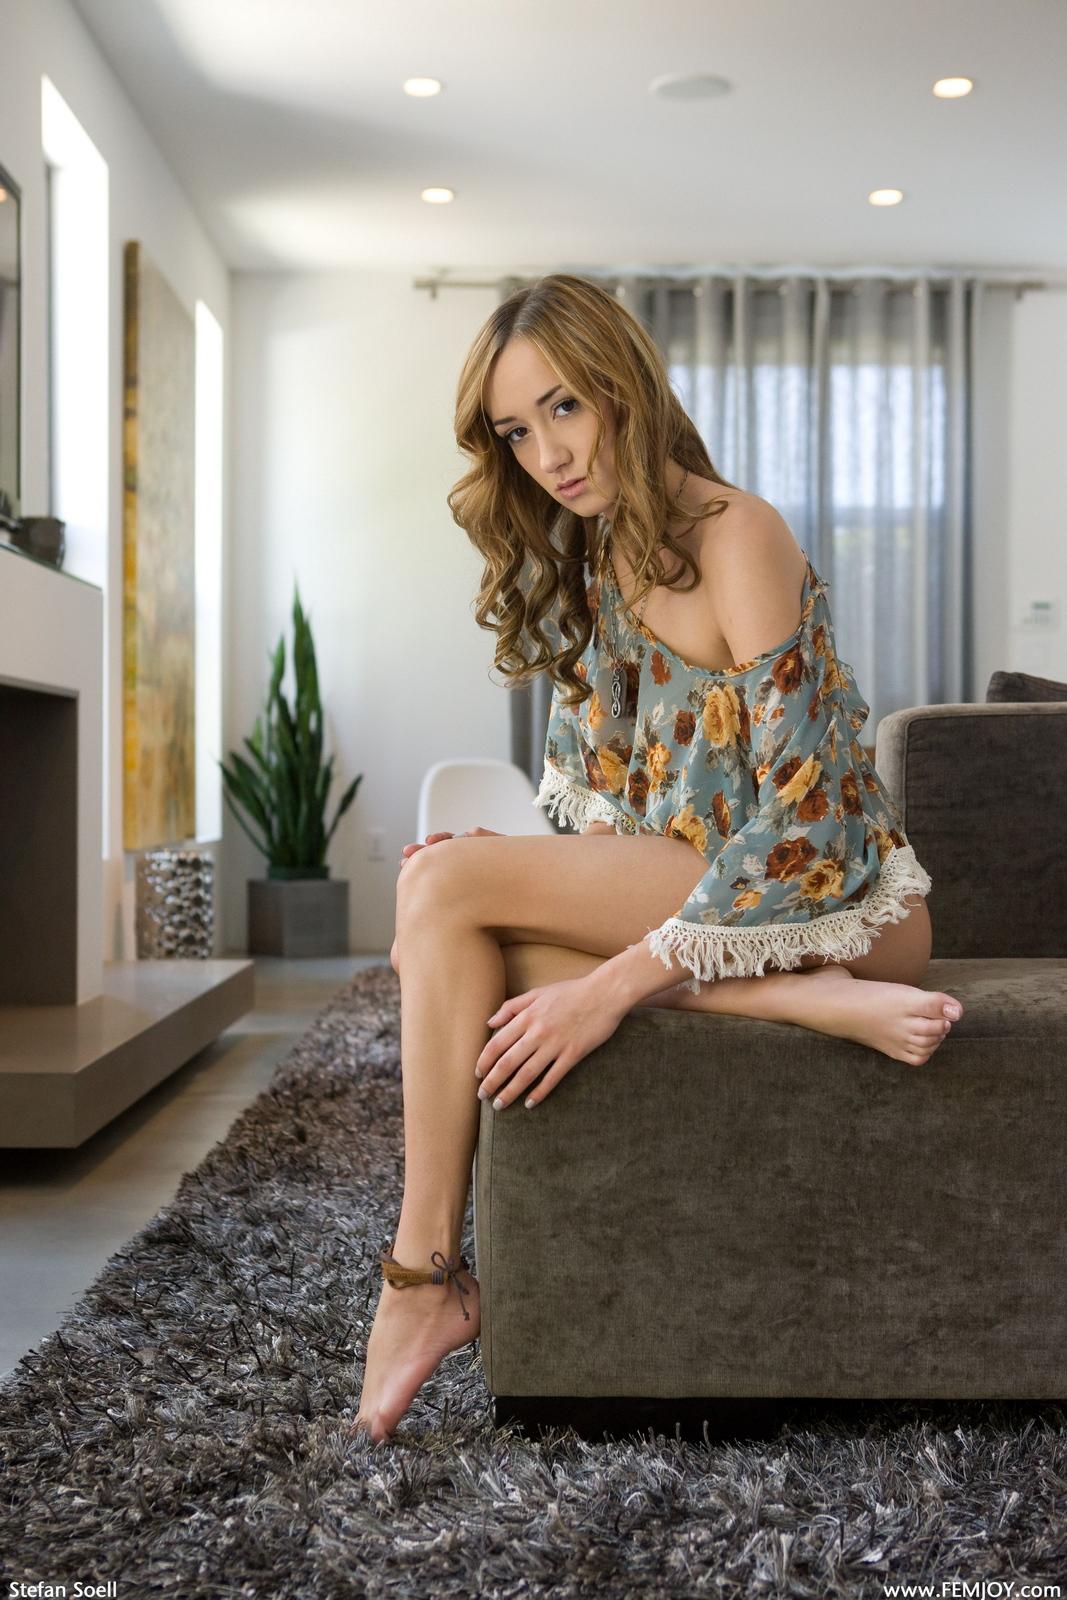 victoria-rae-slim-naked-boobs-apartment-femjoy-03